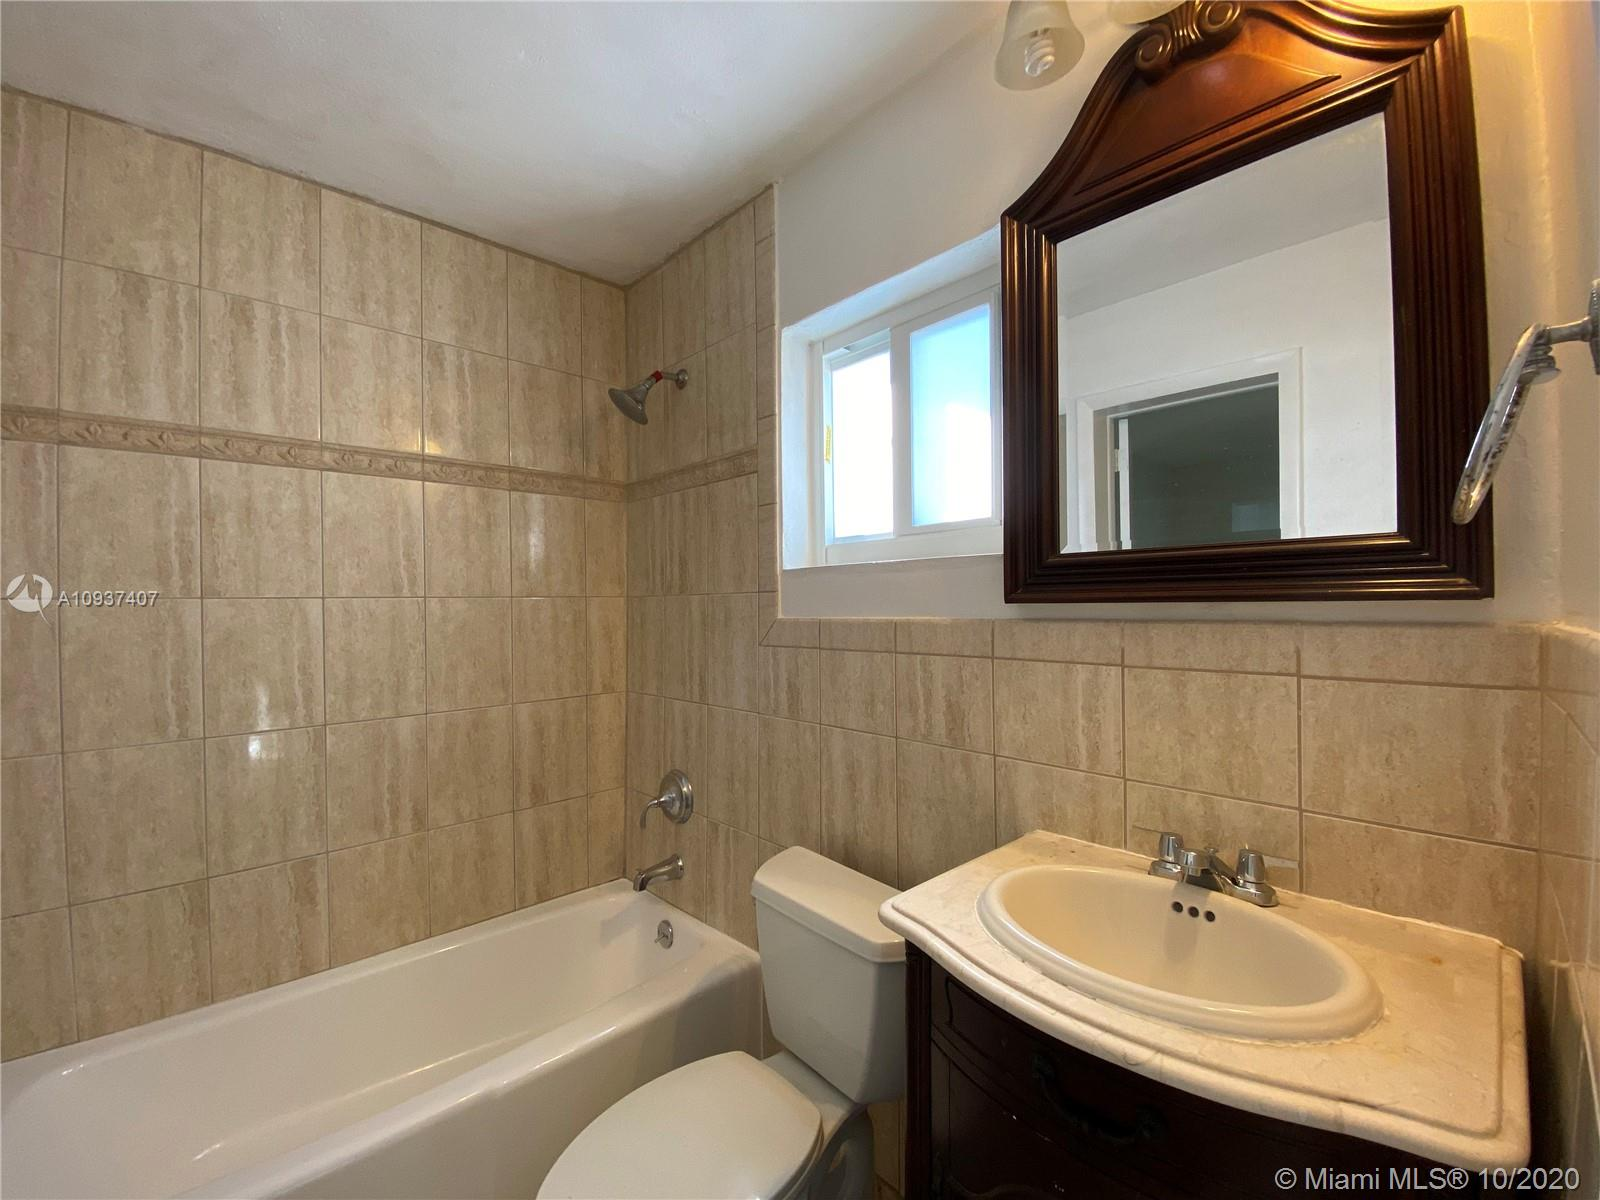 5 / 2 2133 sq. ft. $ 2020-10-05 0 Photo